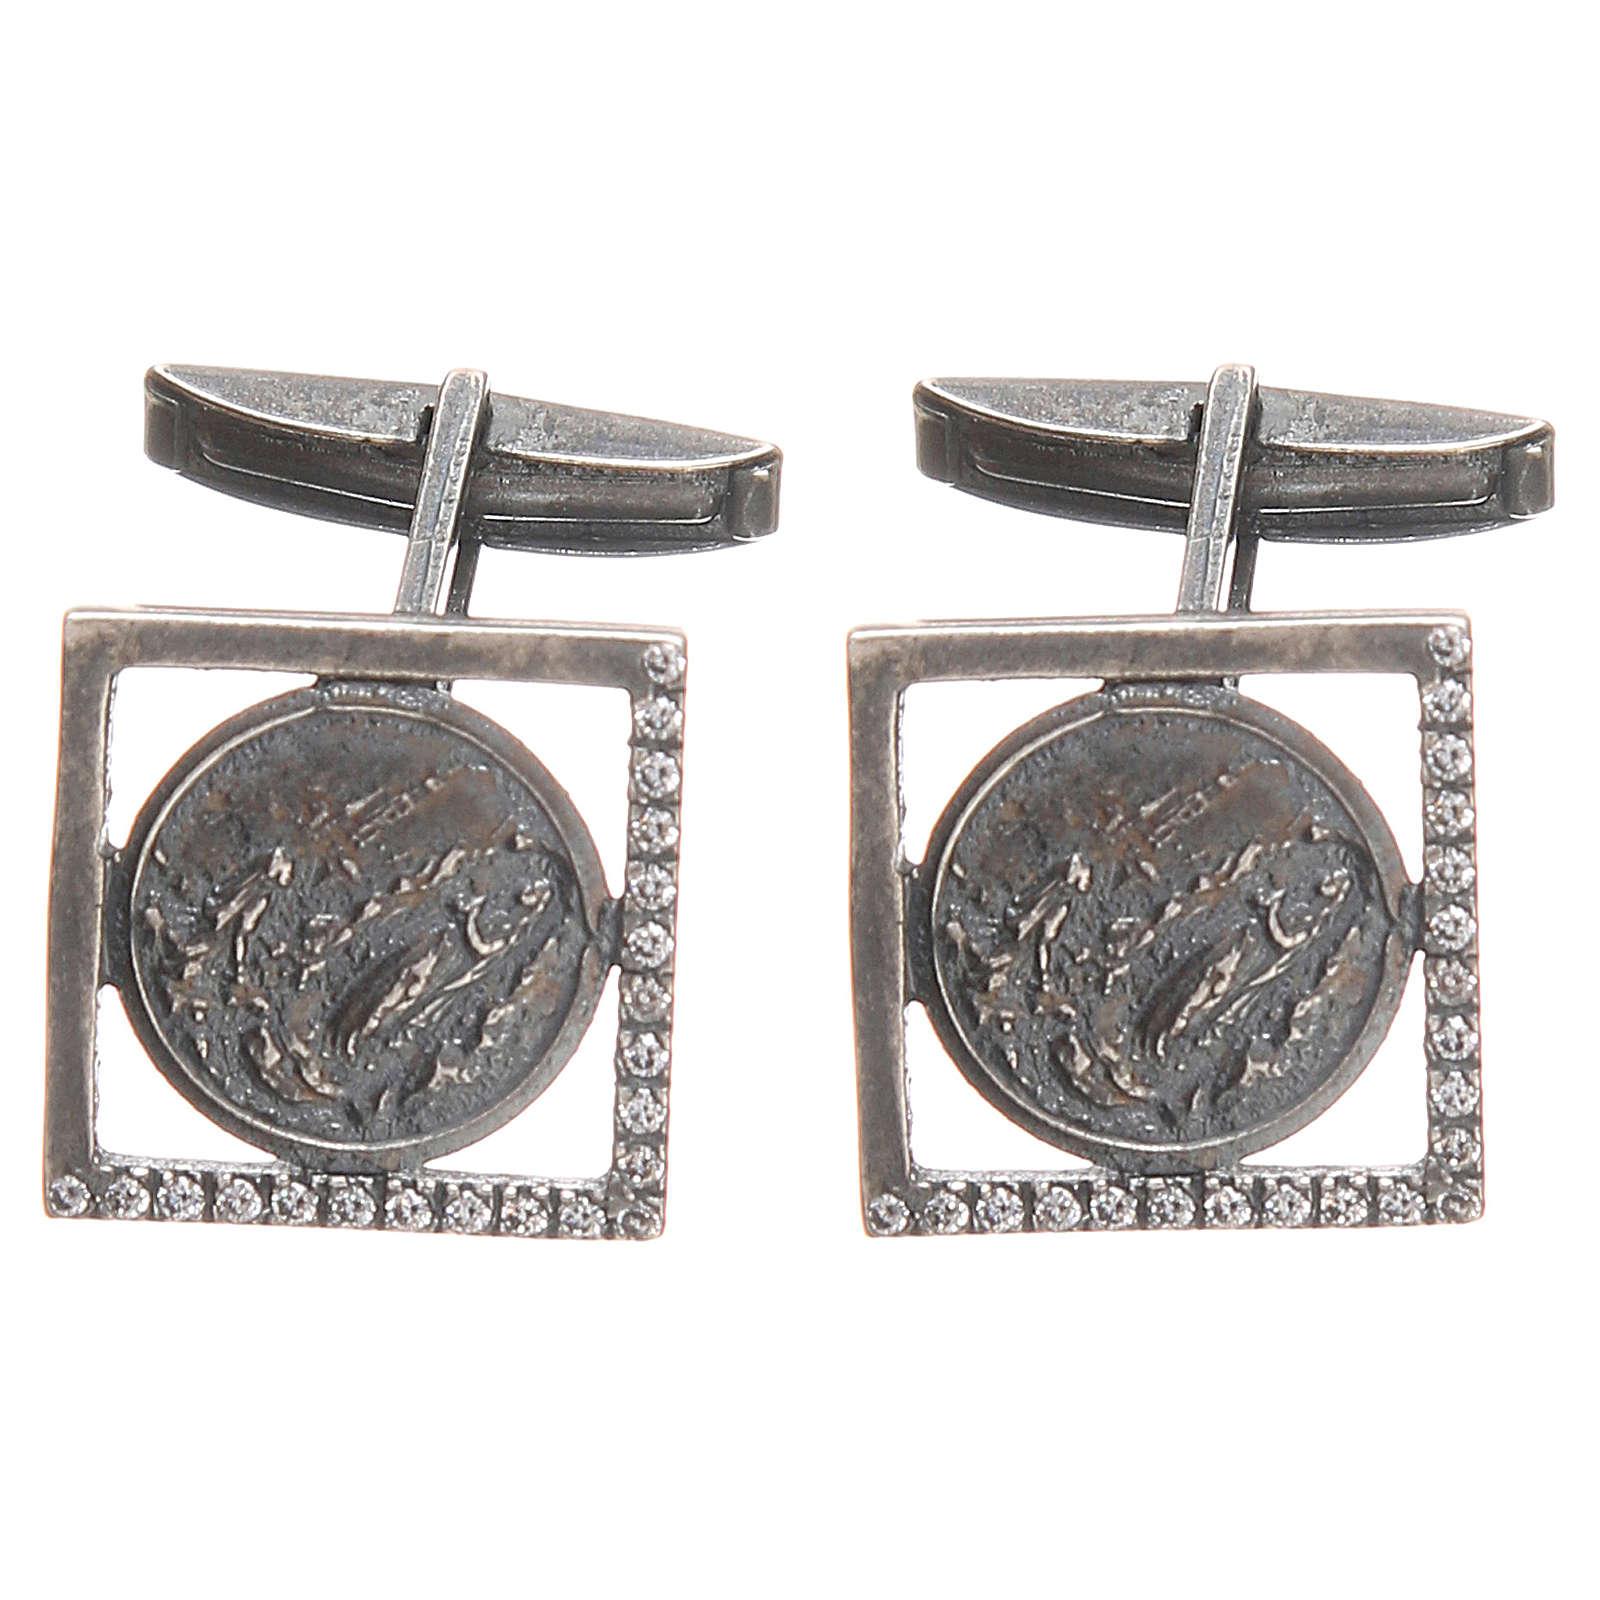 Spinki do koszuli srebro 800 Matka Boża z Lourdes 1.7 cm 4